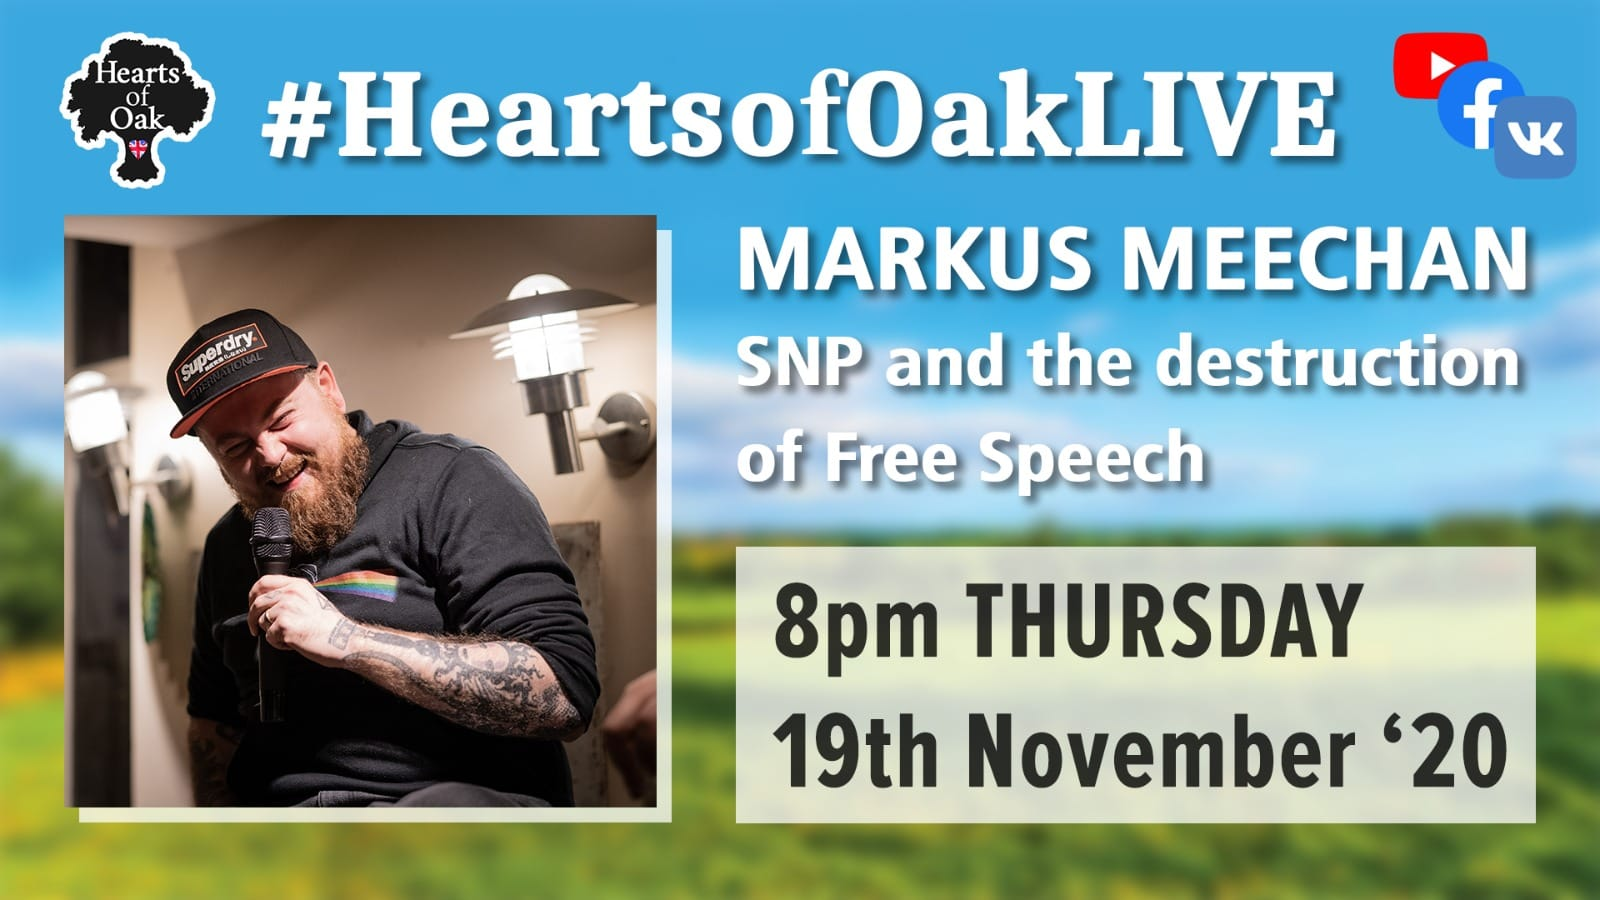 Markus Meechan (Count Dankula) - Why are the SNP destroying free speech in Scotland